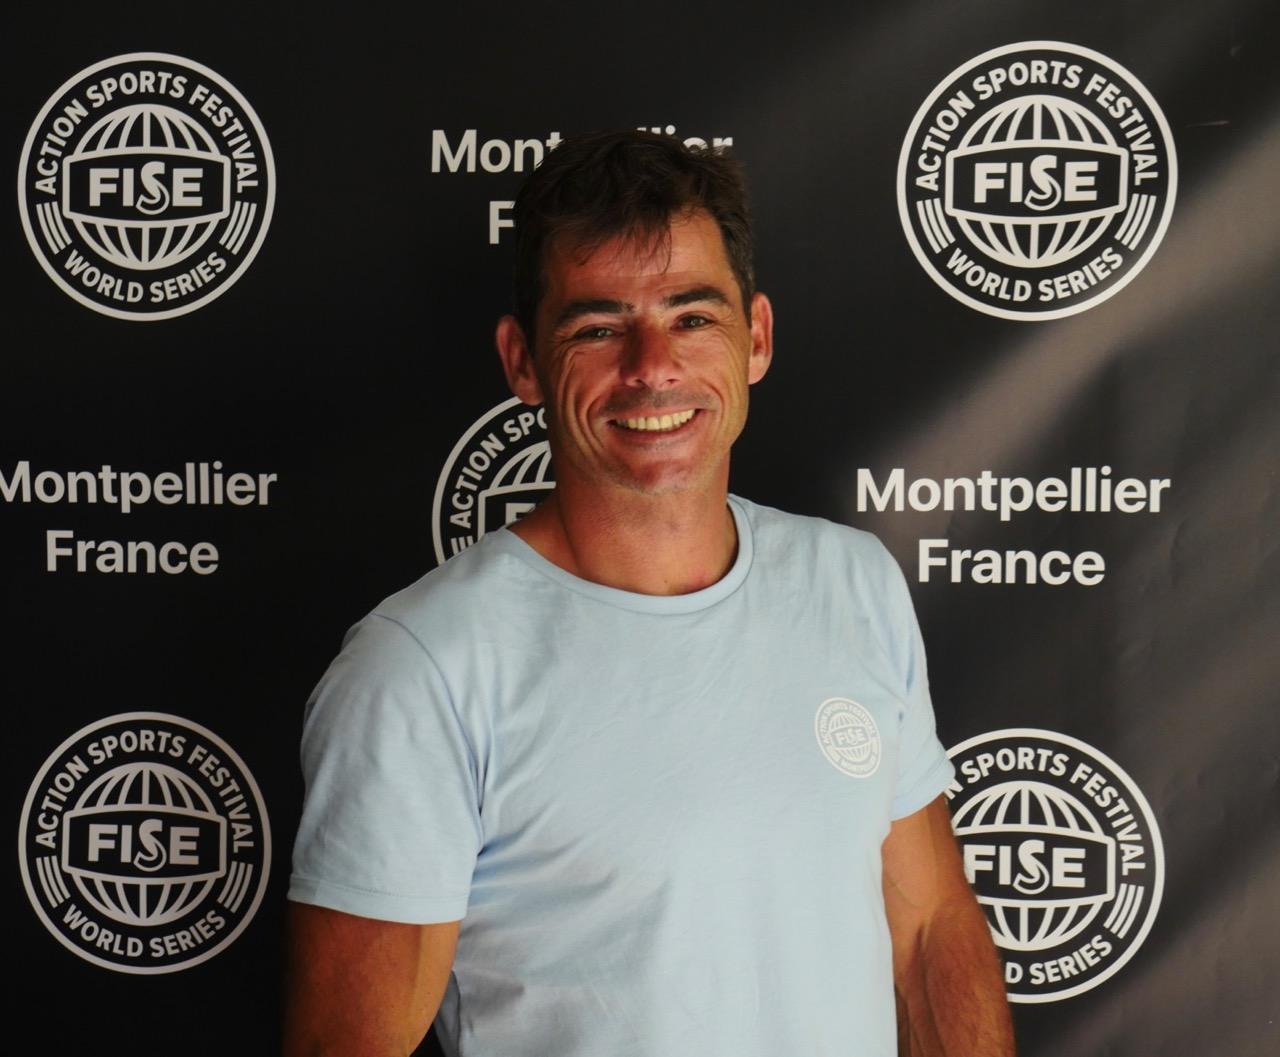 Hervé Andre-Benoit FISE Founder